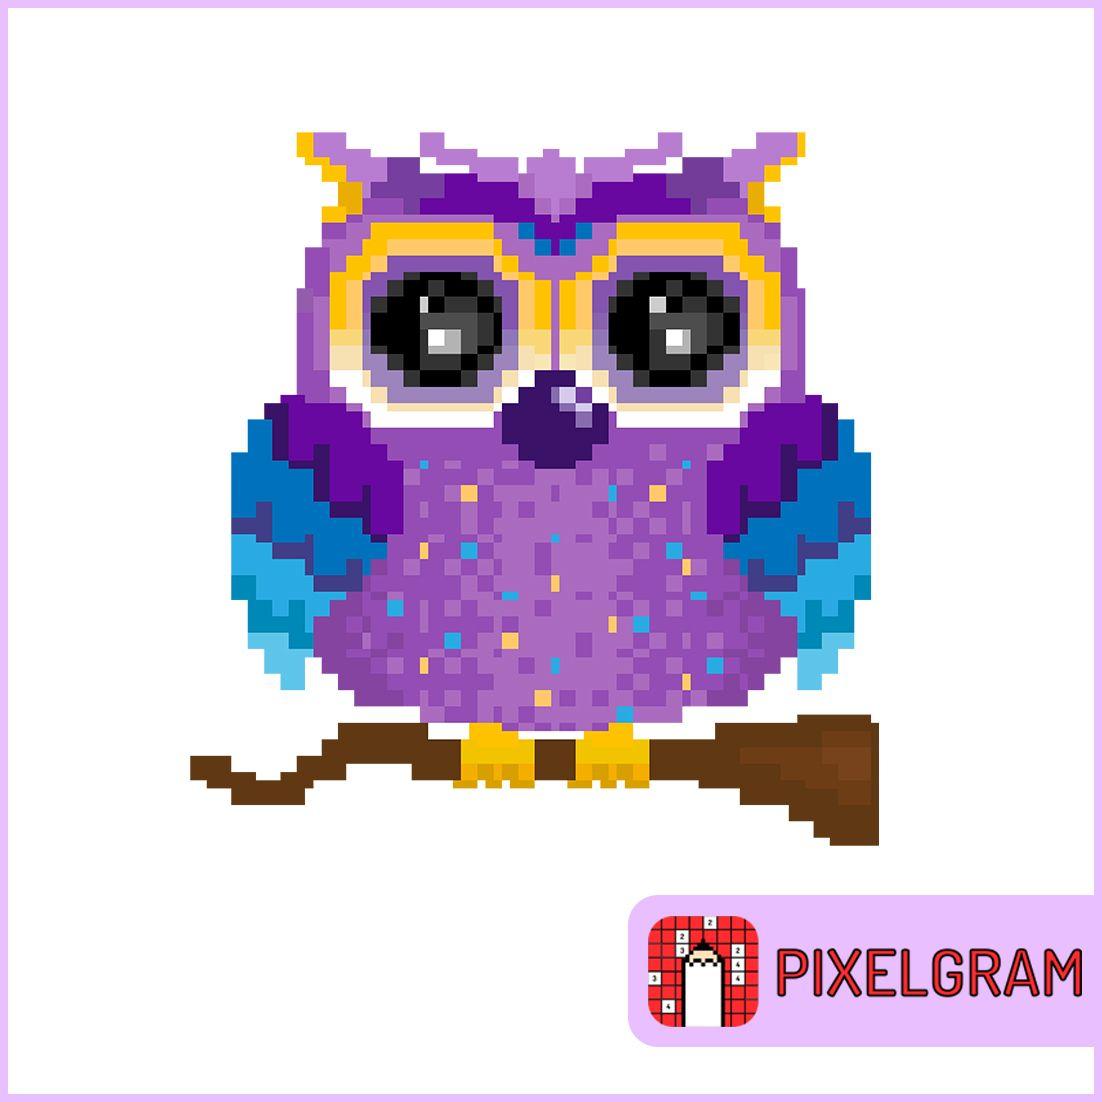 Pixel Purpule Owl Pixelgram Pixel Art Game Color By